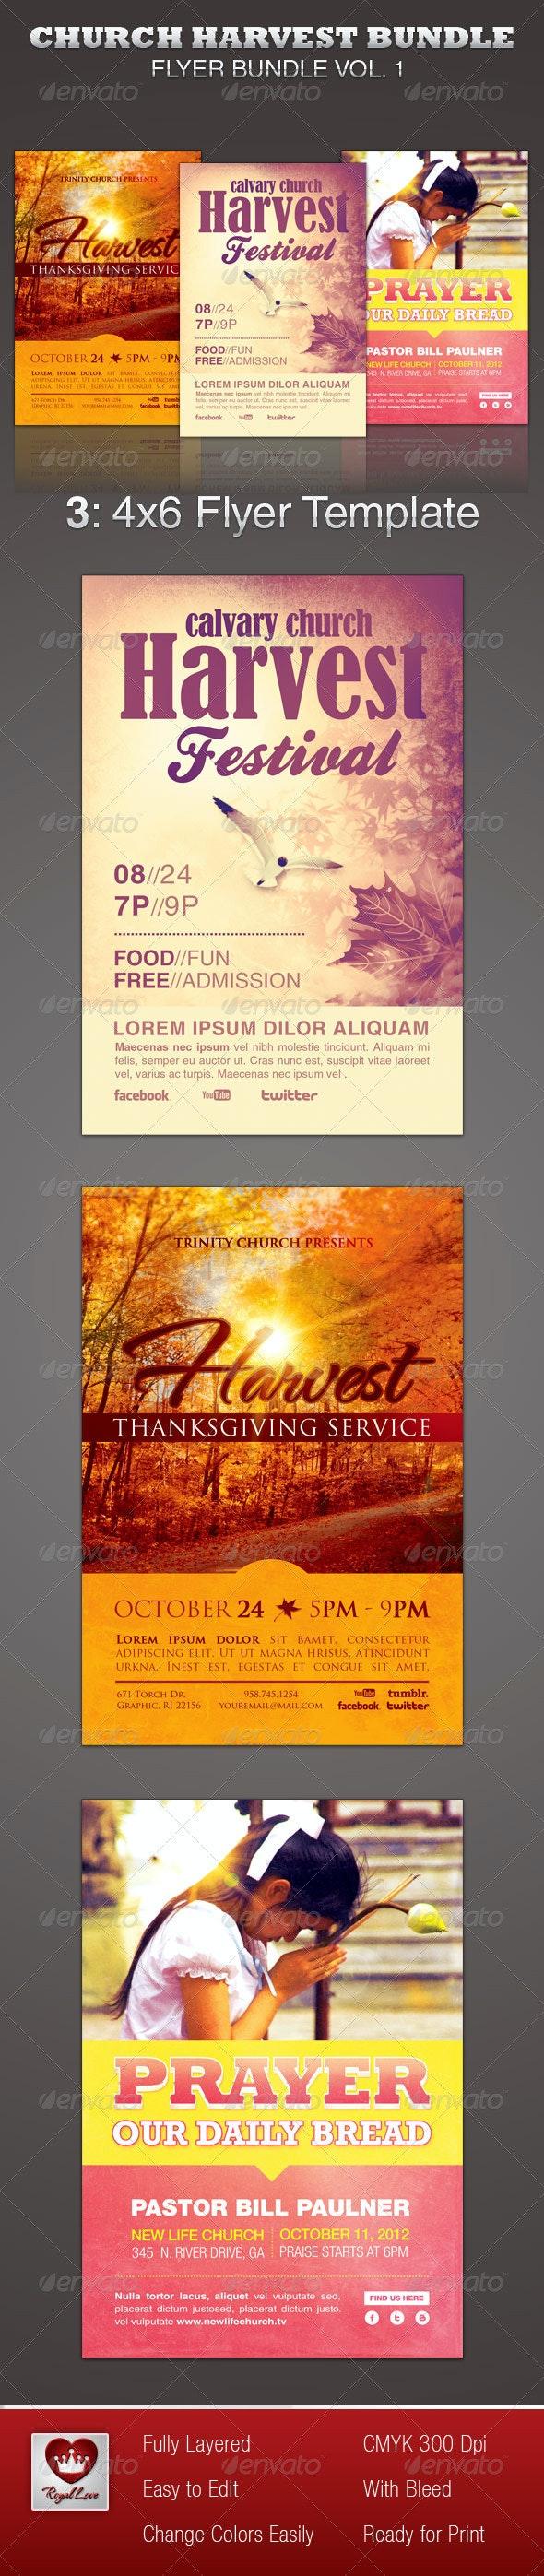 Church Harvest Flyer Template Bundle - Church Flyers